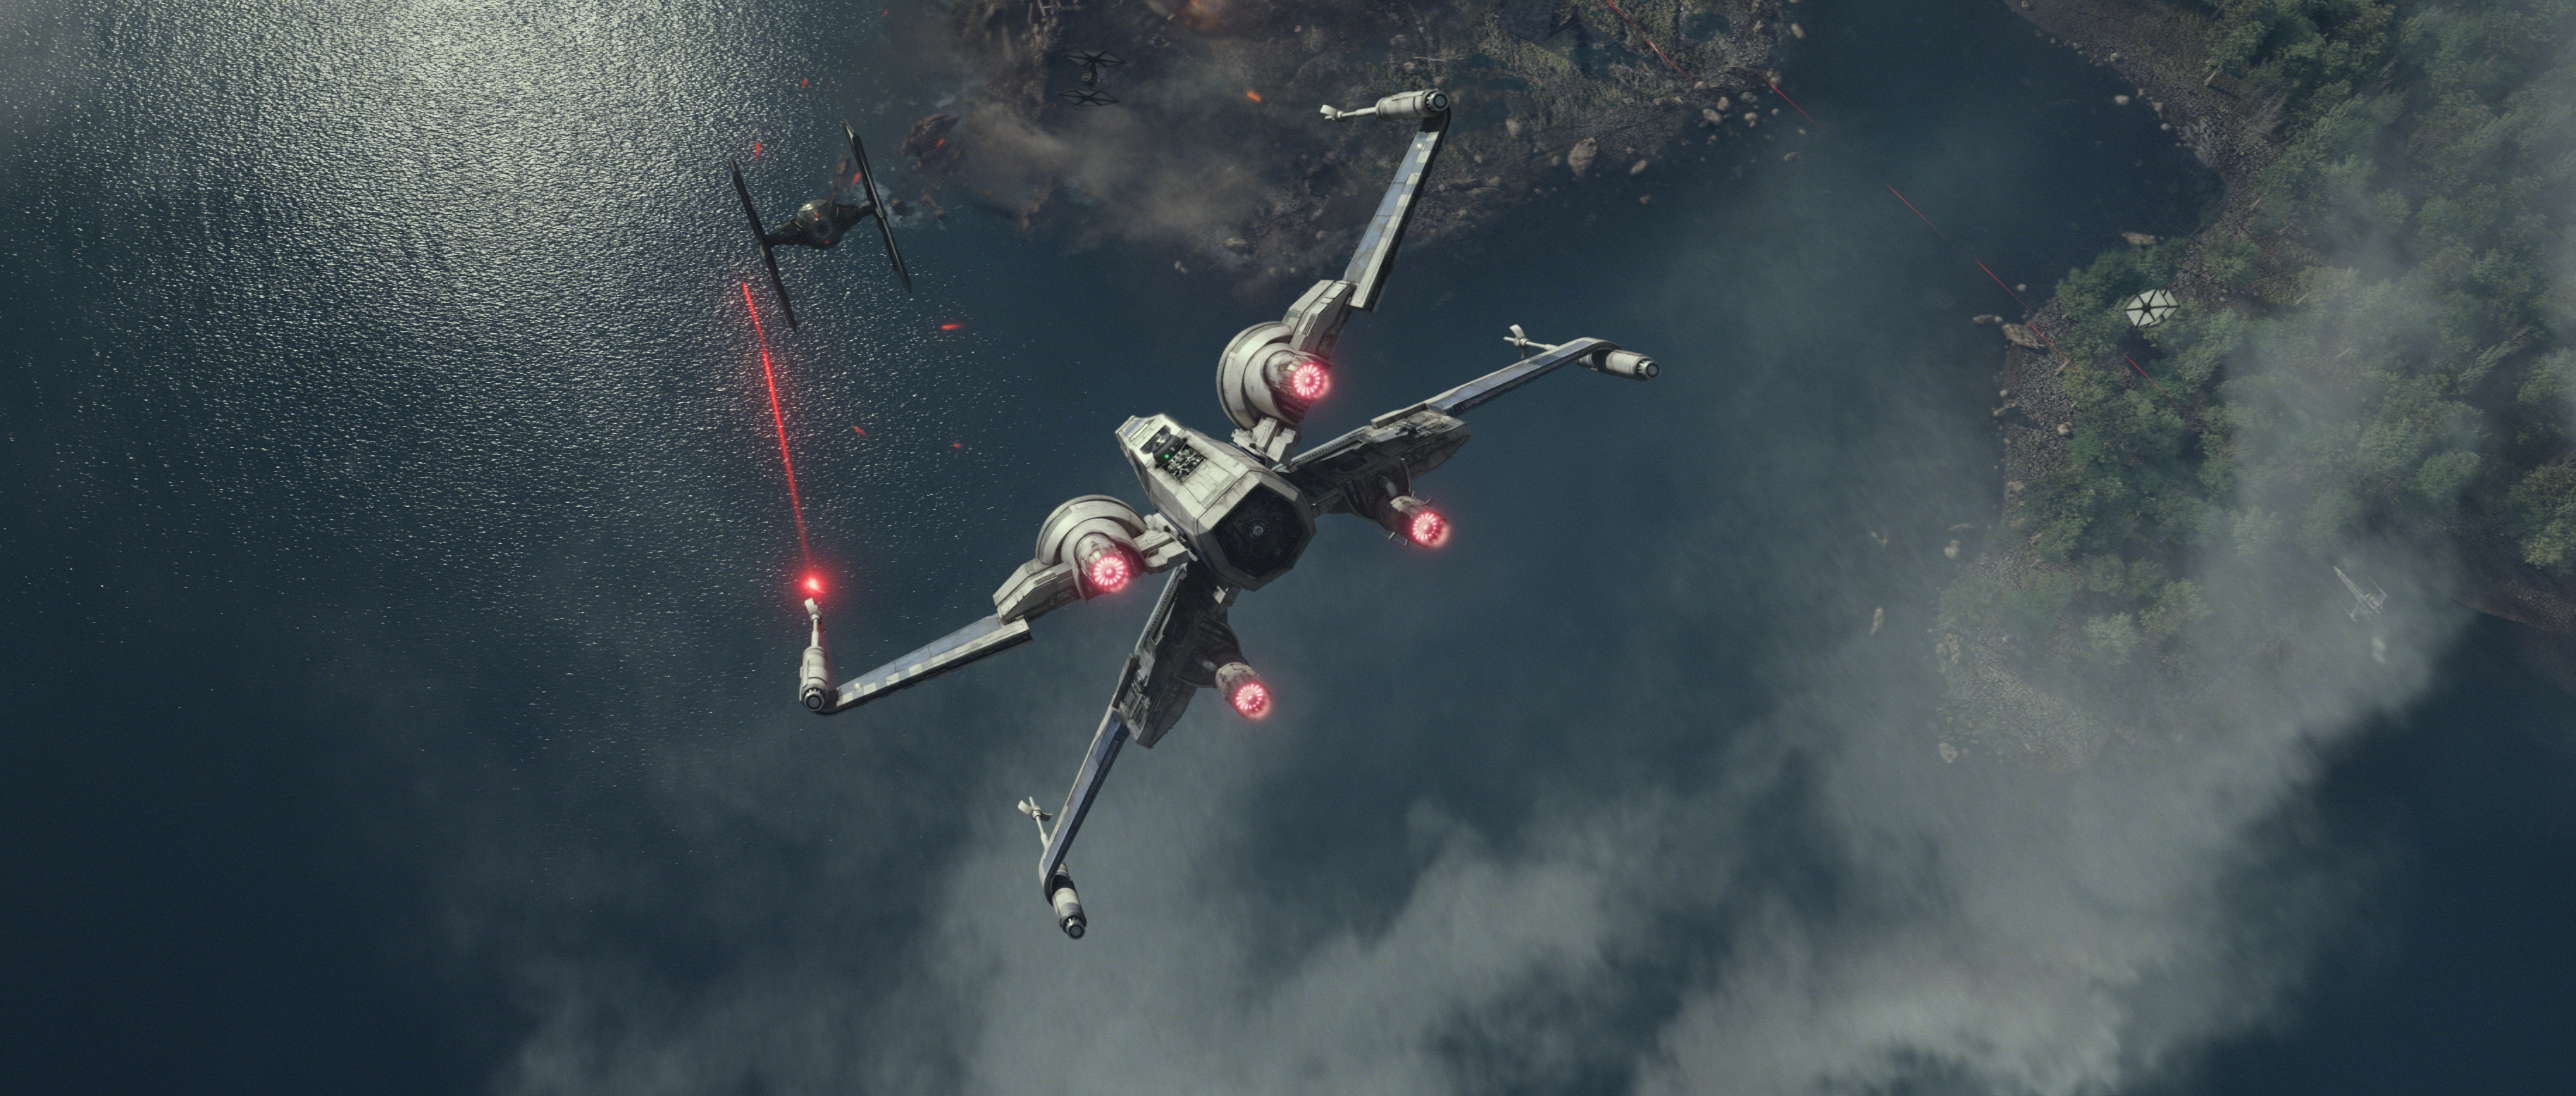 Star-Wars-7-Trailer-3-X-Wing-vs-Tie-Fighters